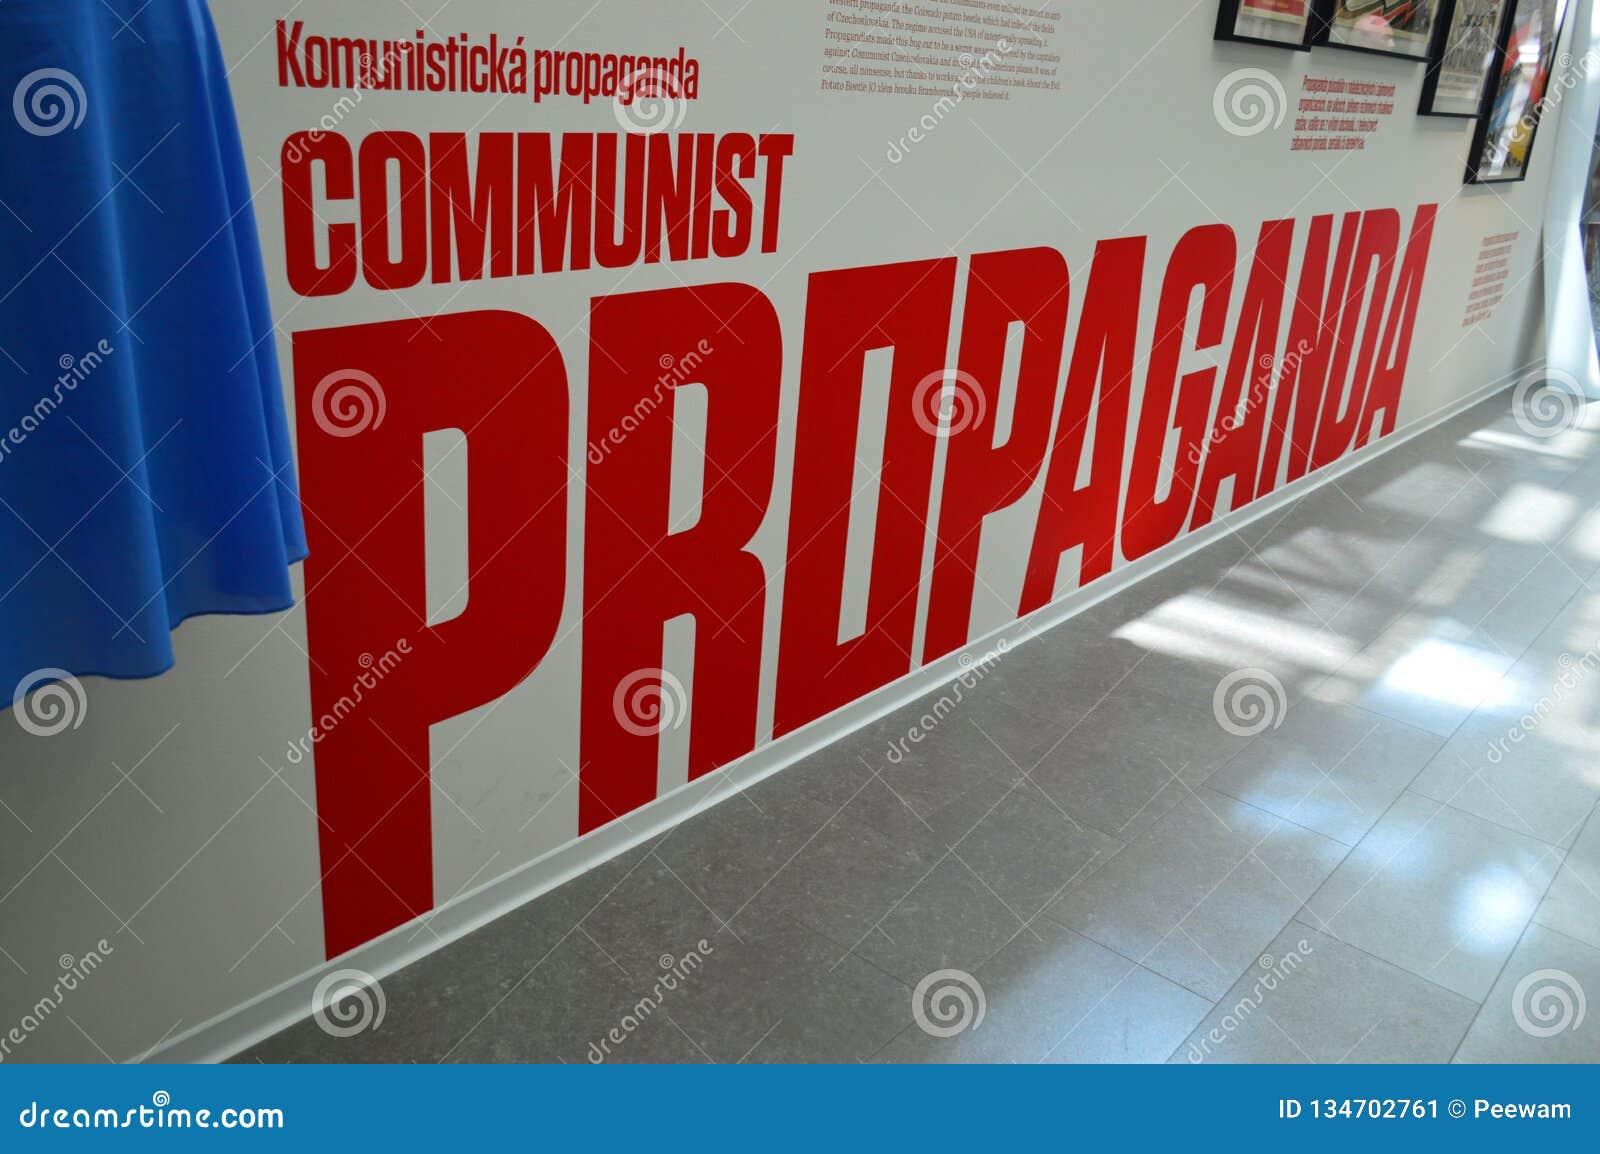 Communist artefacts - Propaganda sign - Museum Prague